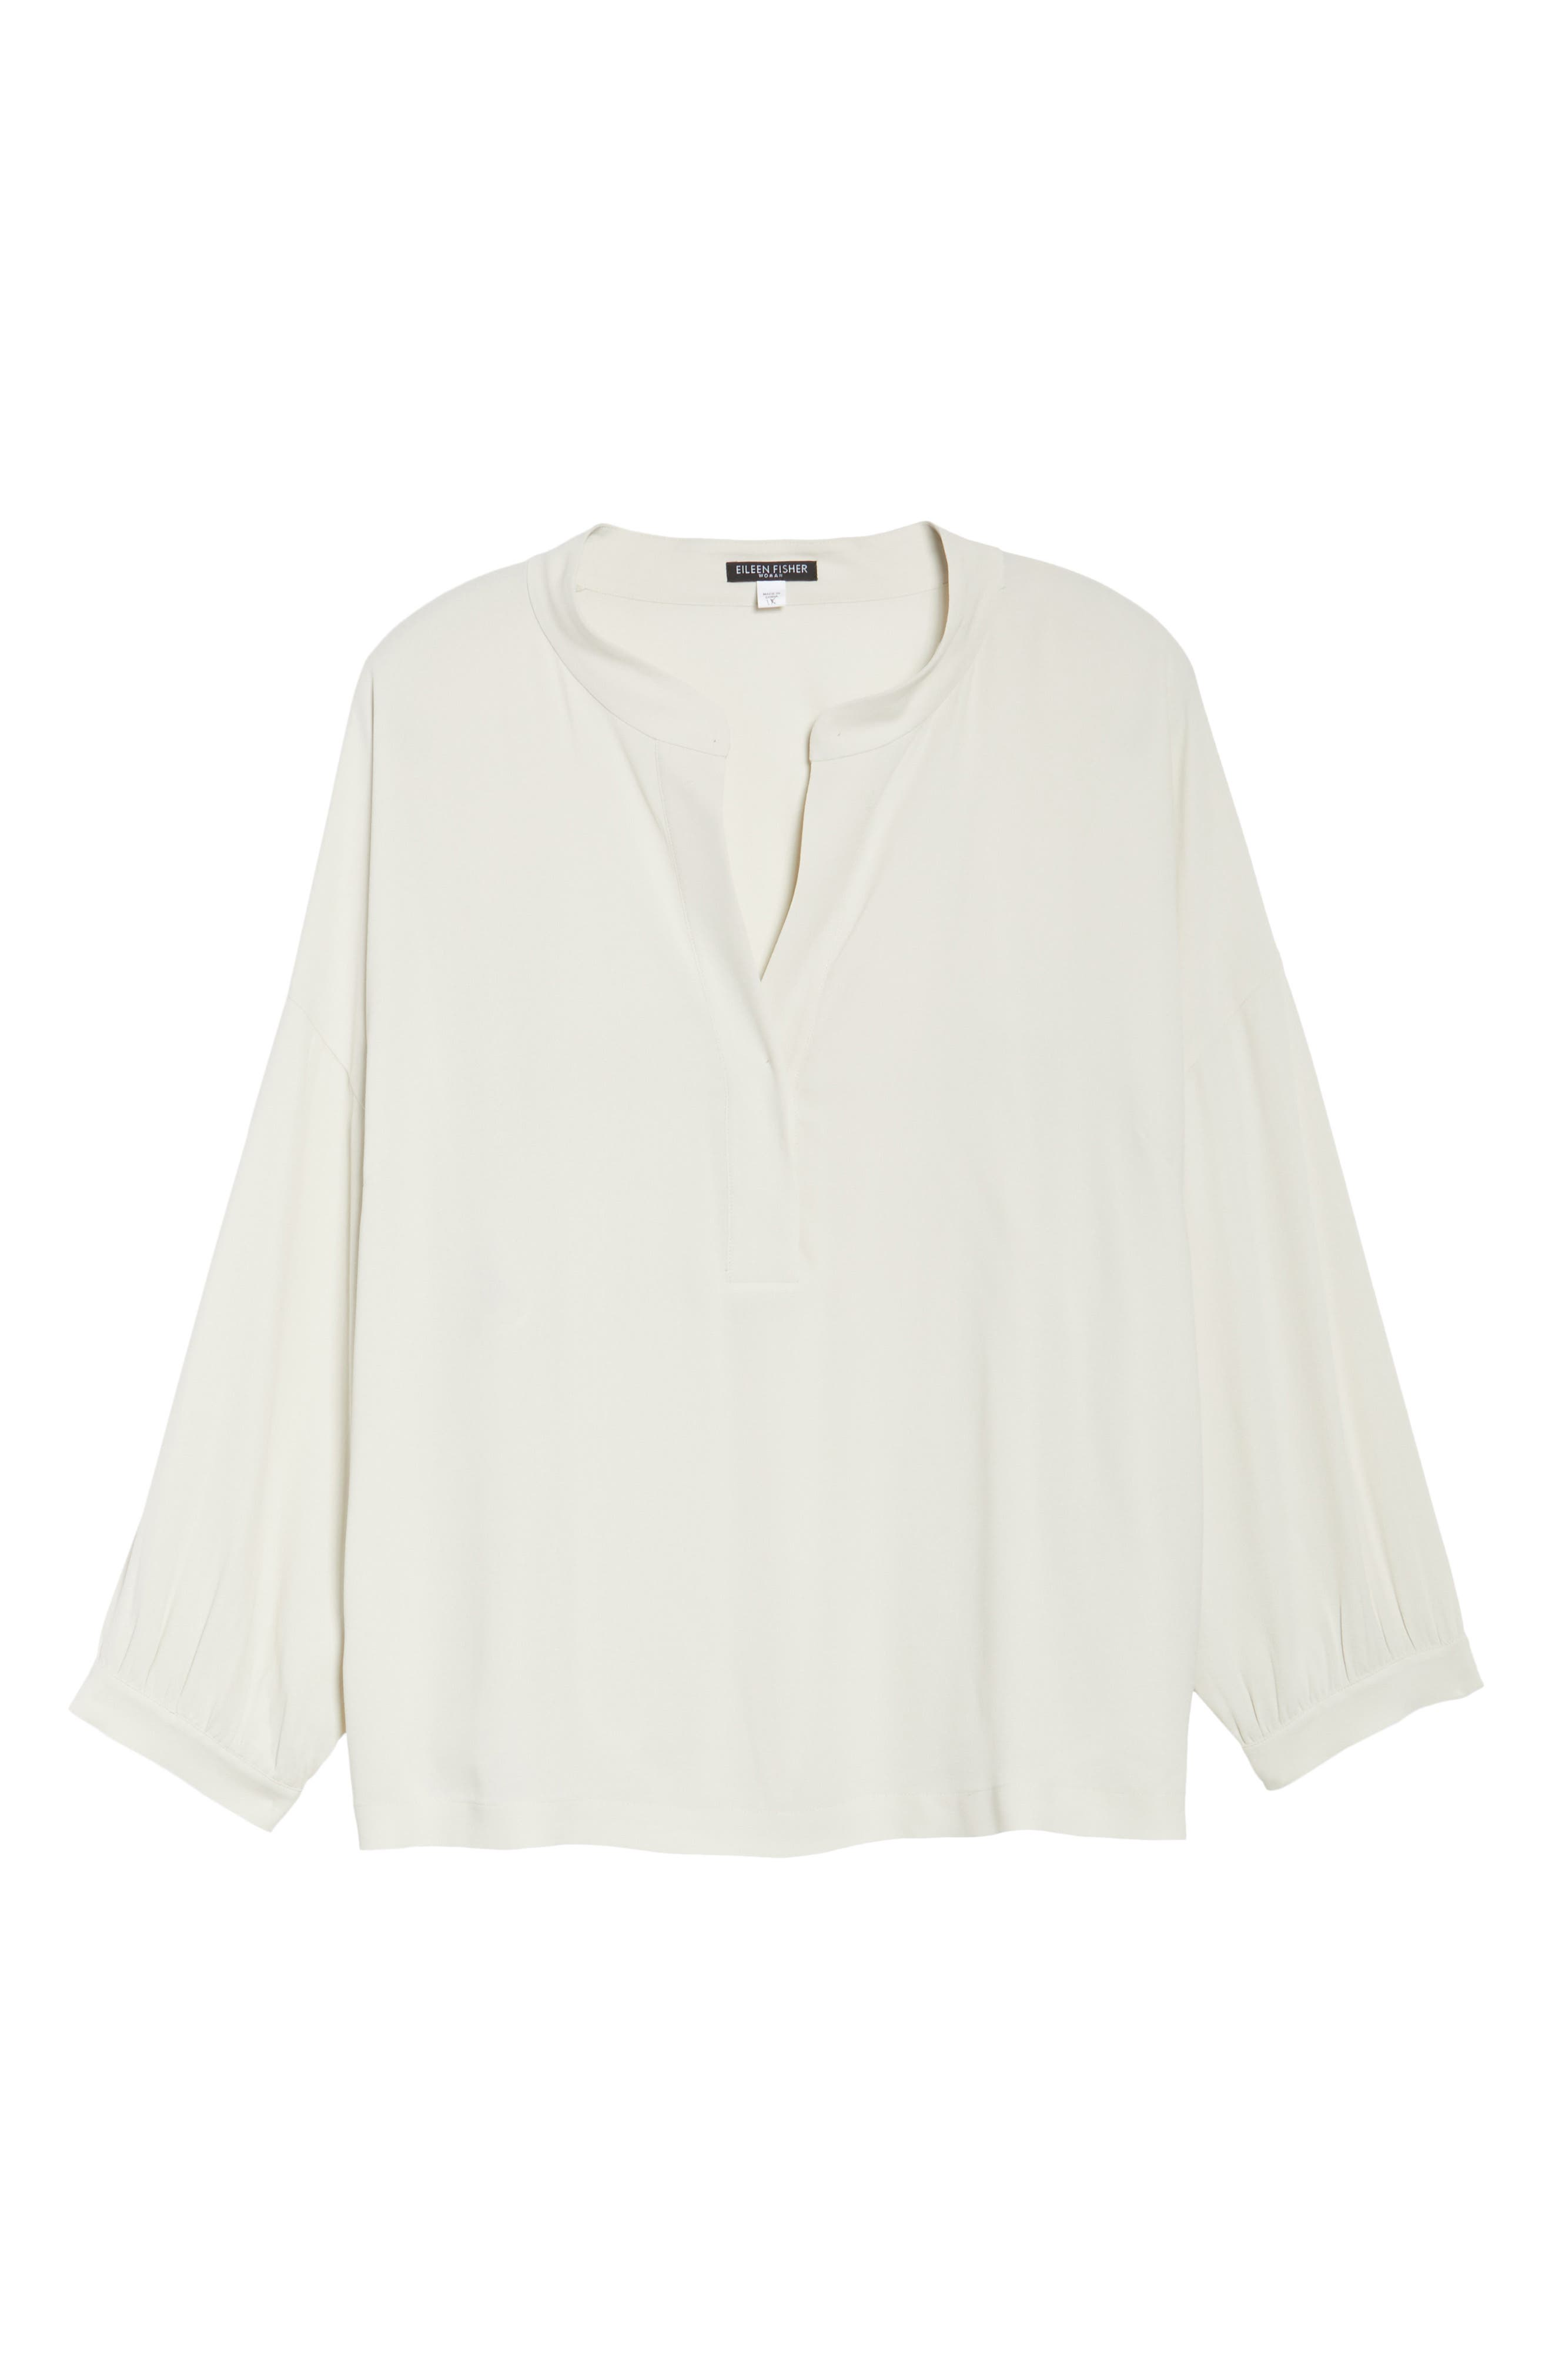 Silk Shirt,                             Alternate thumbnail 6, color,                             907